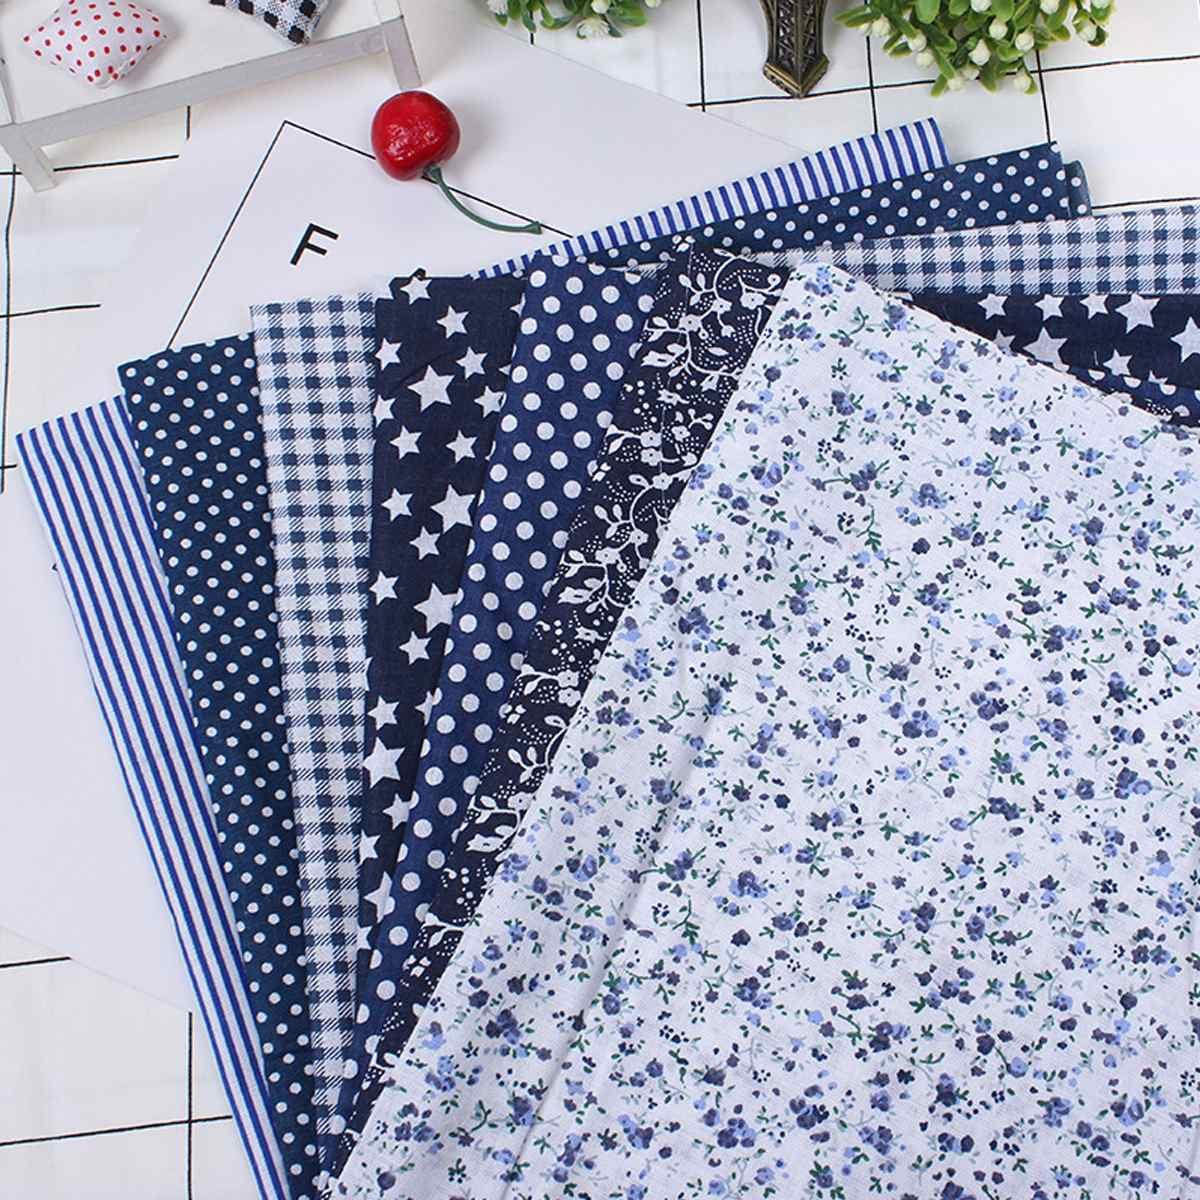 7 Pcs/Set DIY Assorted Pre-Cut Square Bundle Charm Cotton Floral Quilt Fabric Patchwork For Beginner/Practicing Sewing Job